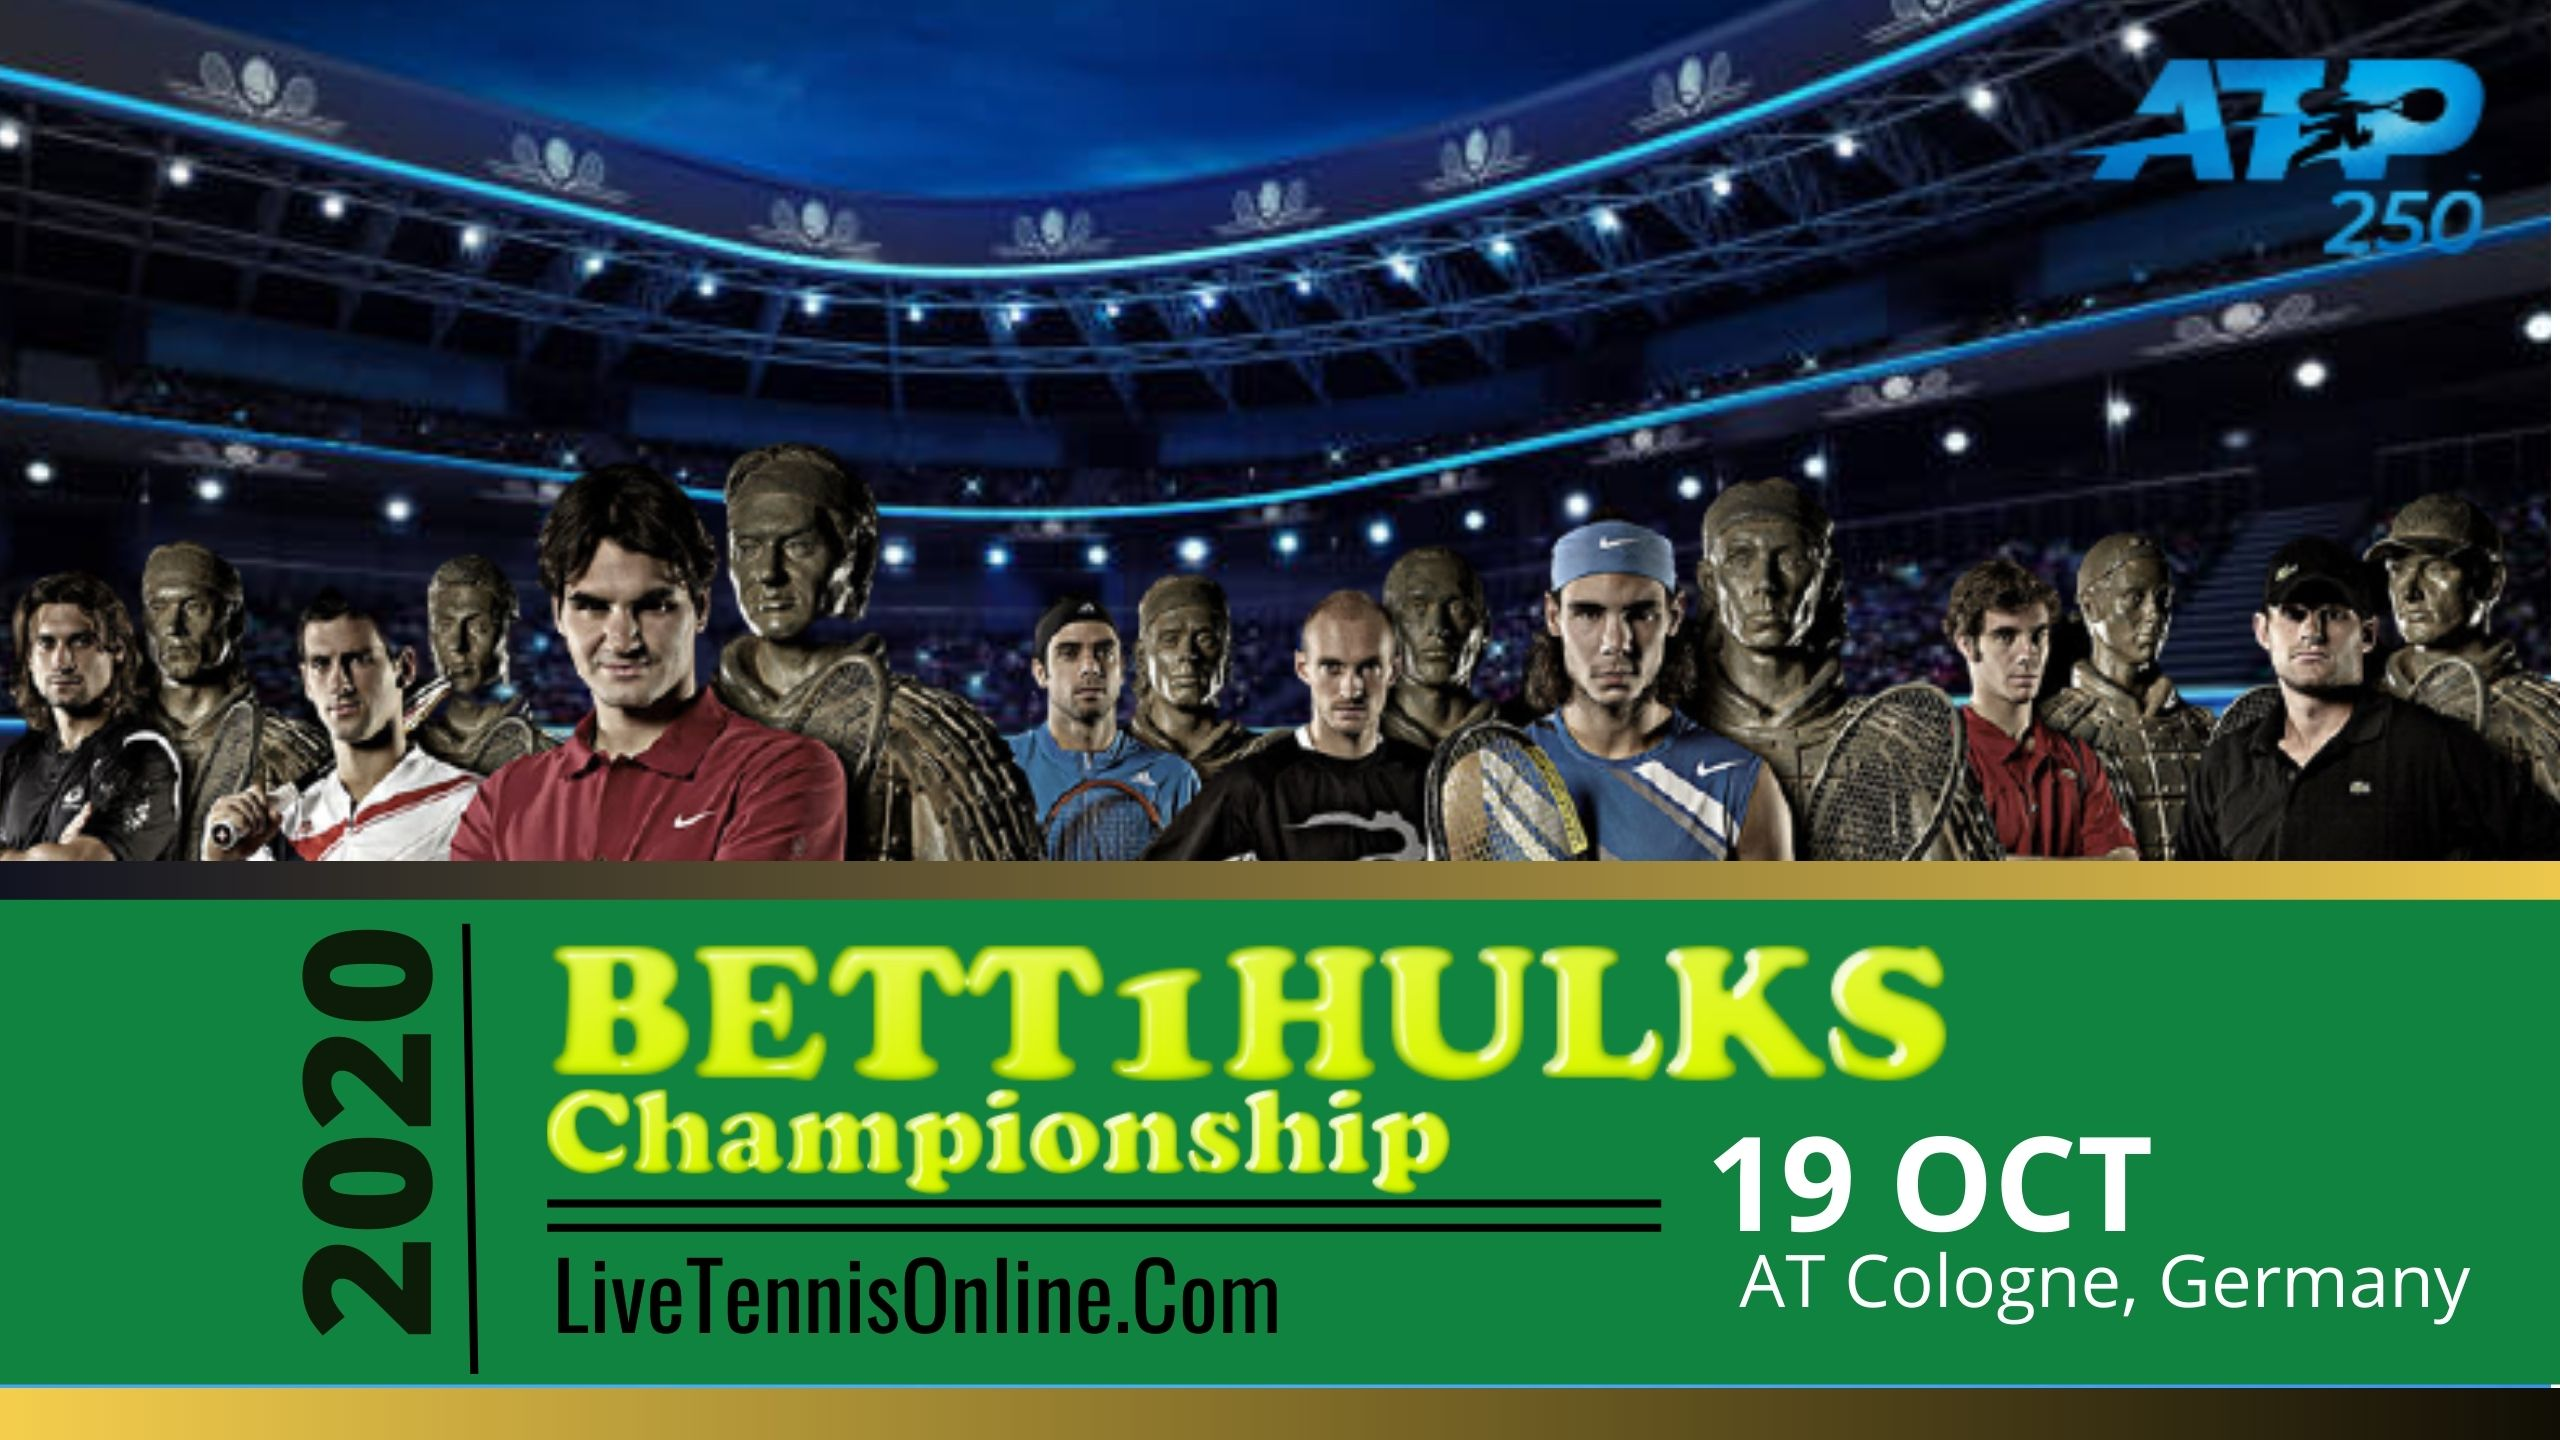 ATP bett1HULKS Championships Live Stream